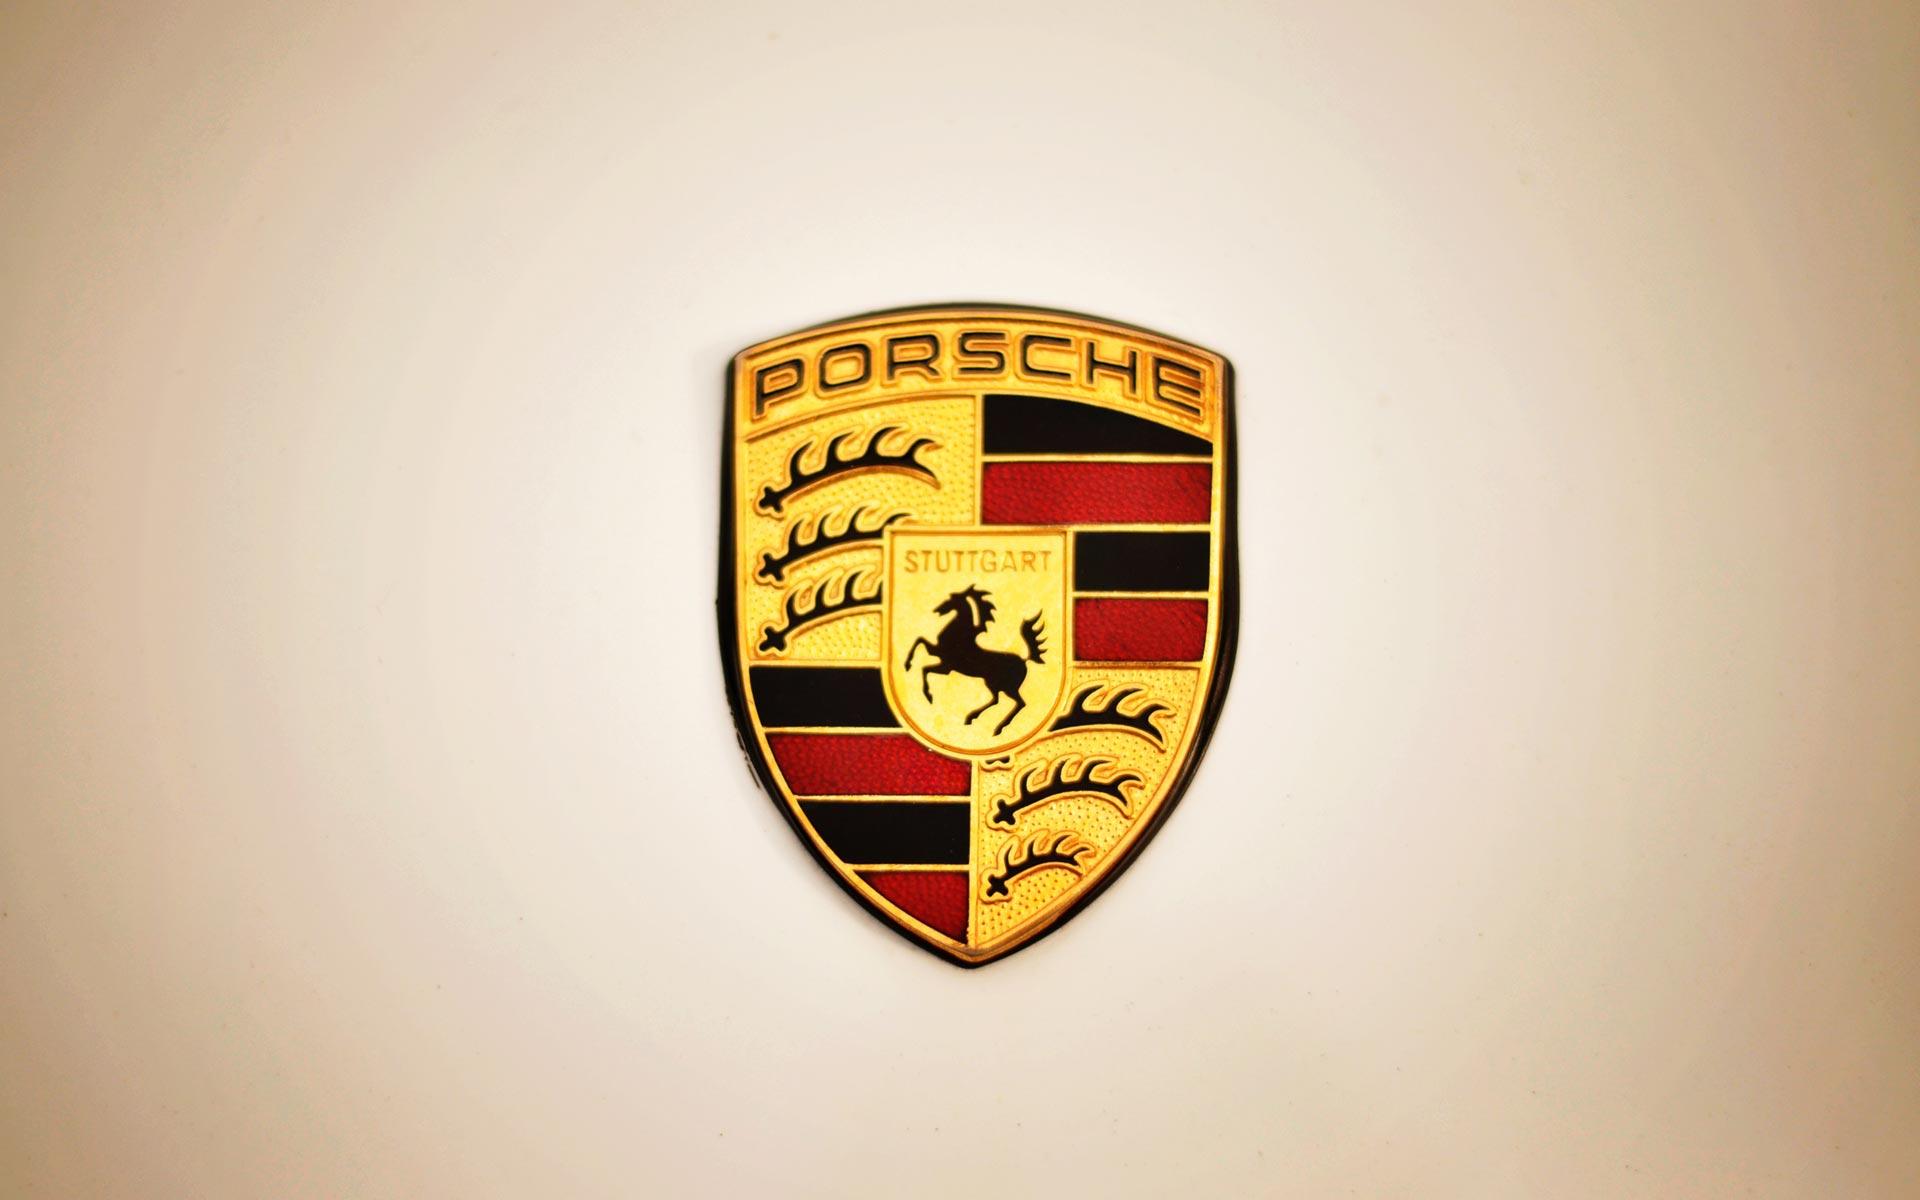 Cars Symbol Wallpaper Porsche Logo Wallpapers Pictures Images